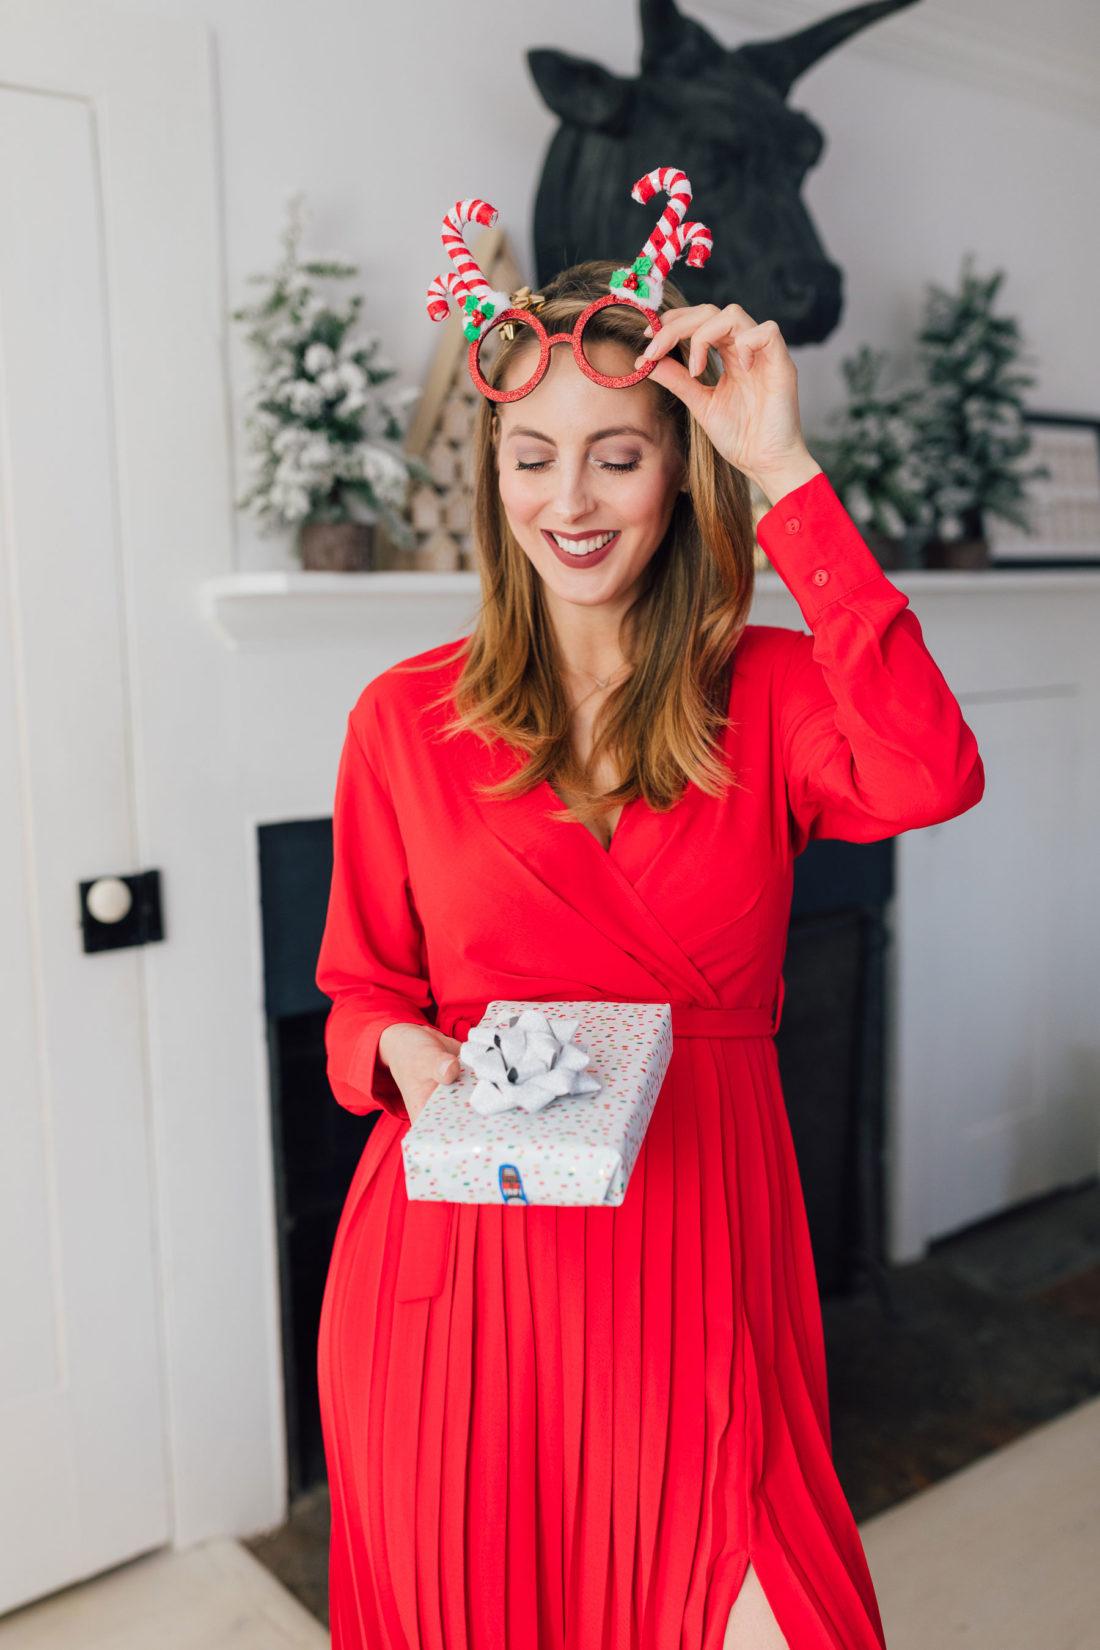 Eva Amurri shares her gift giving philosophy before the holidays